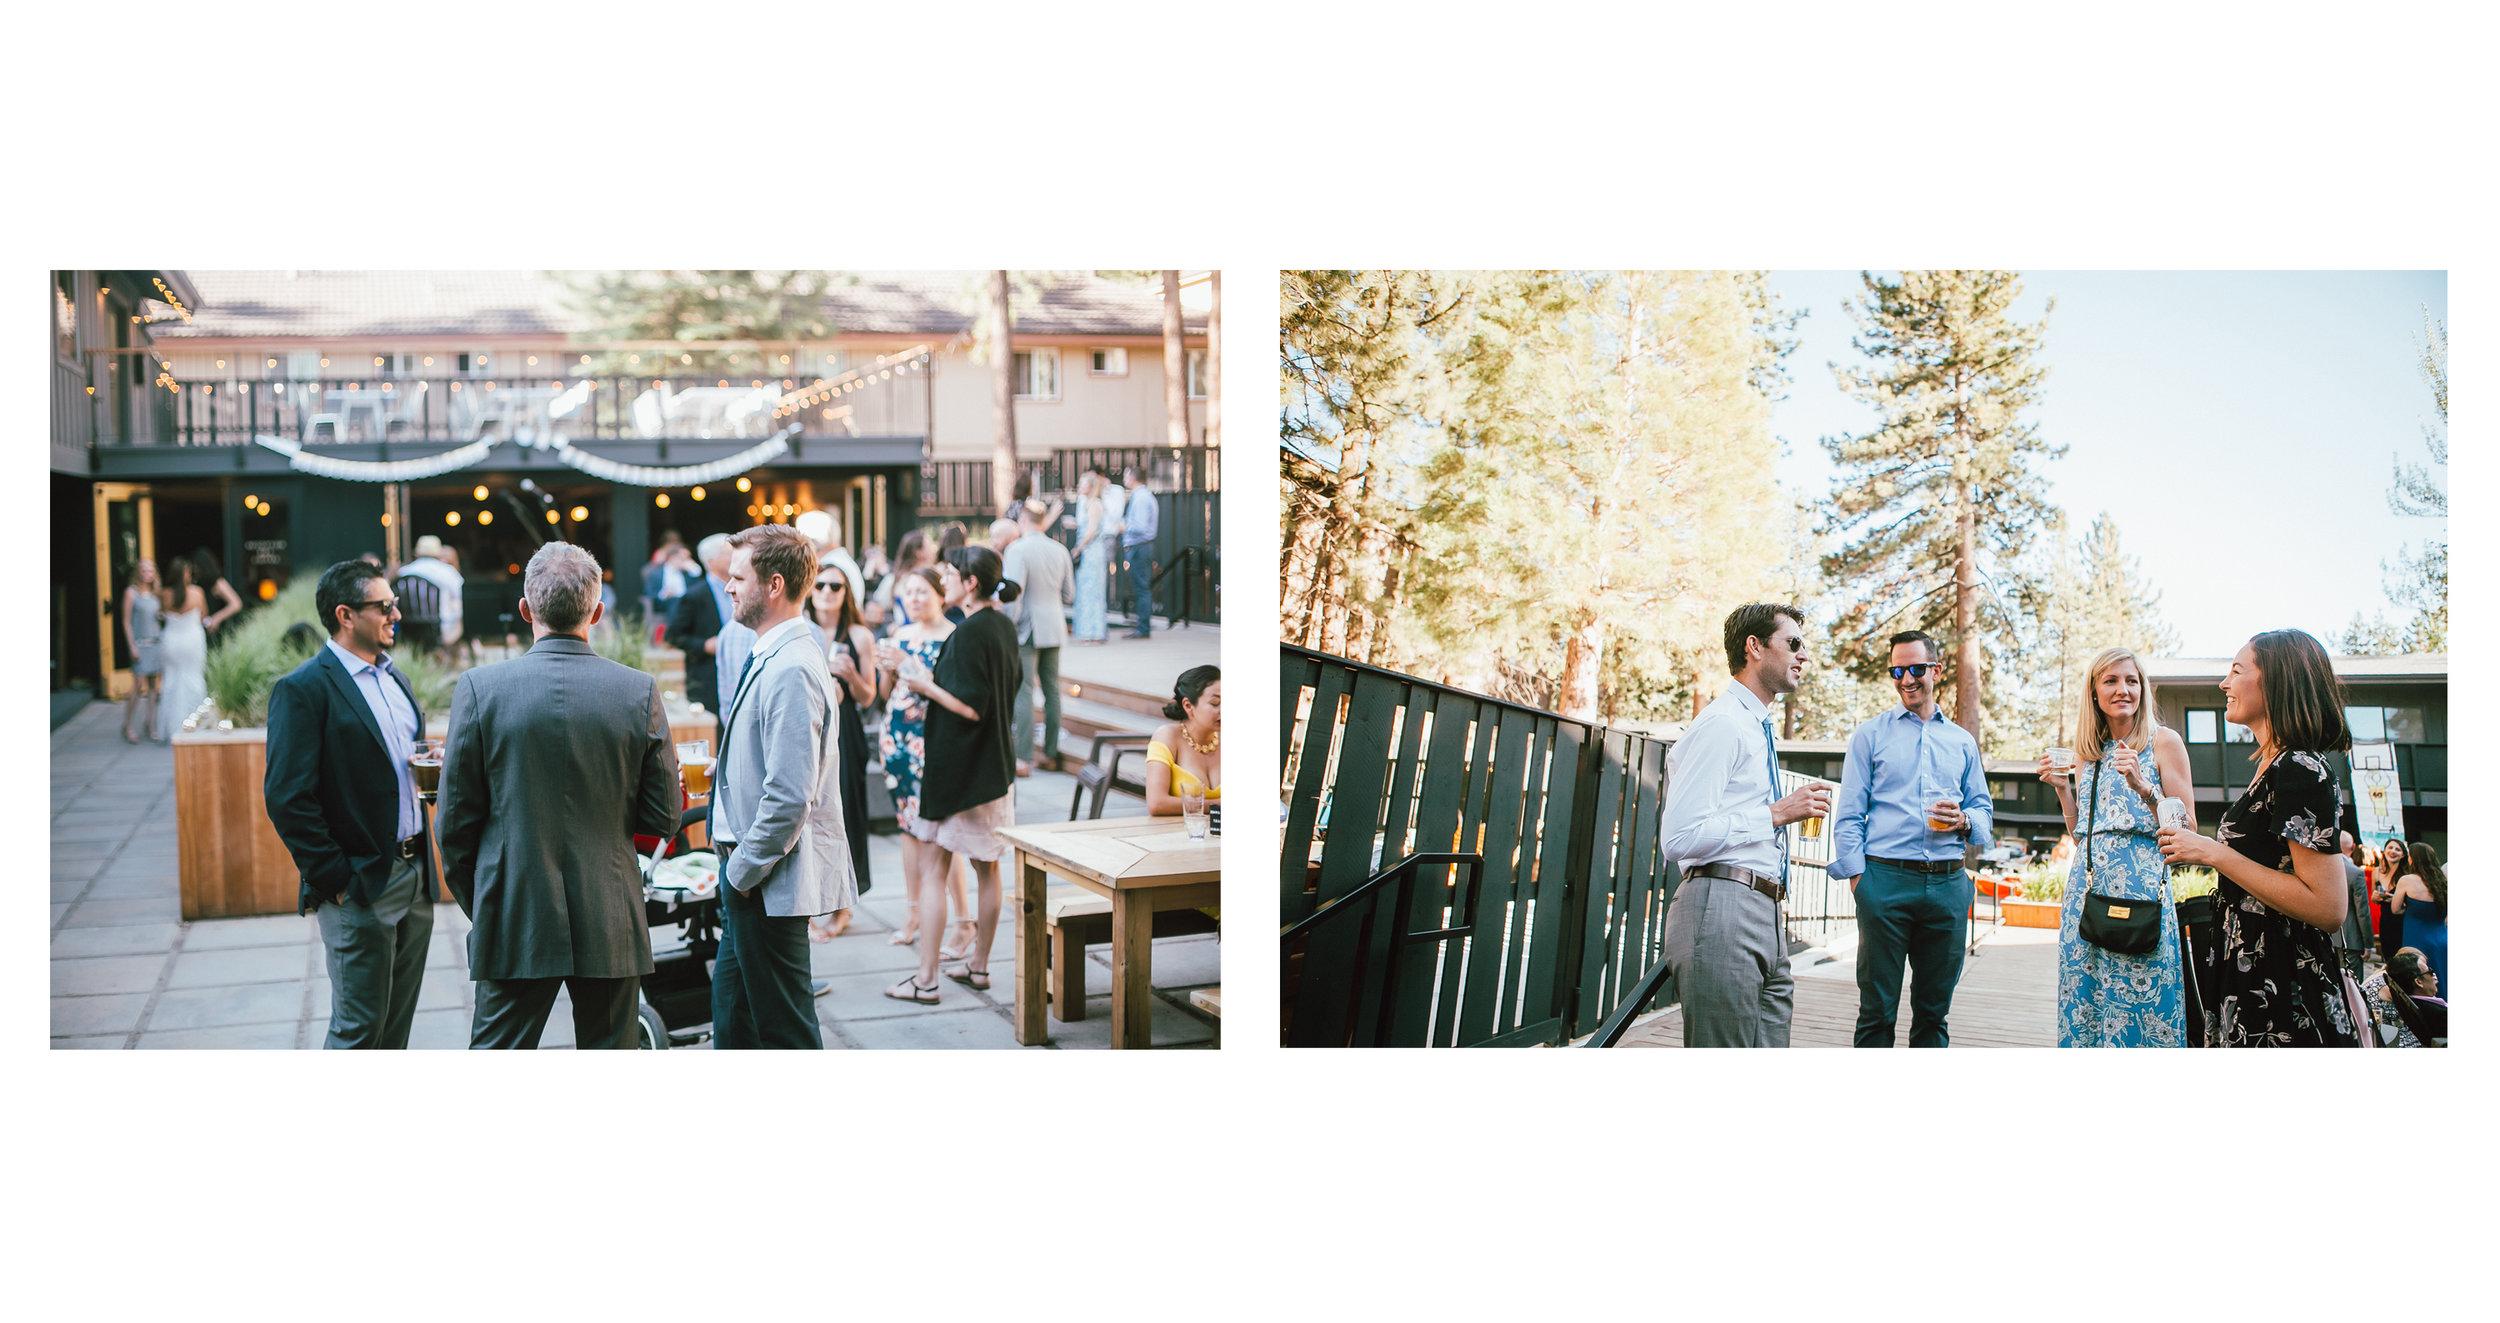 Melisa&David_Wedding_Day_029.jpg